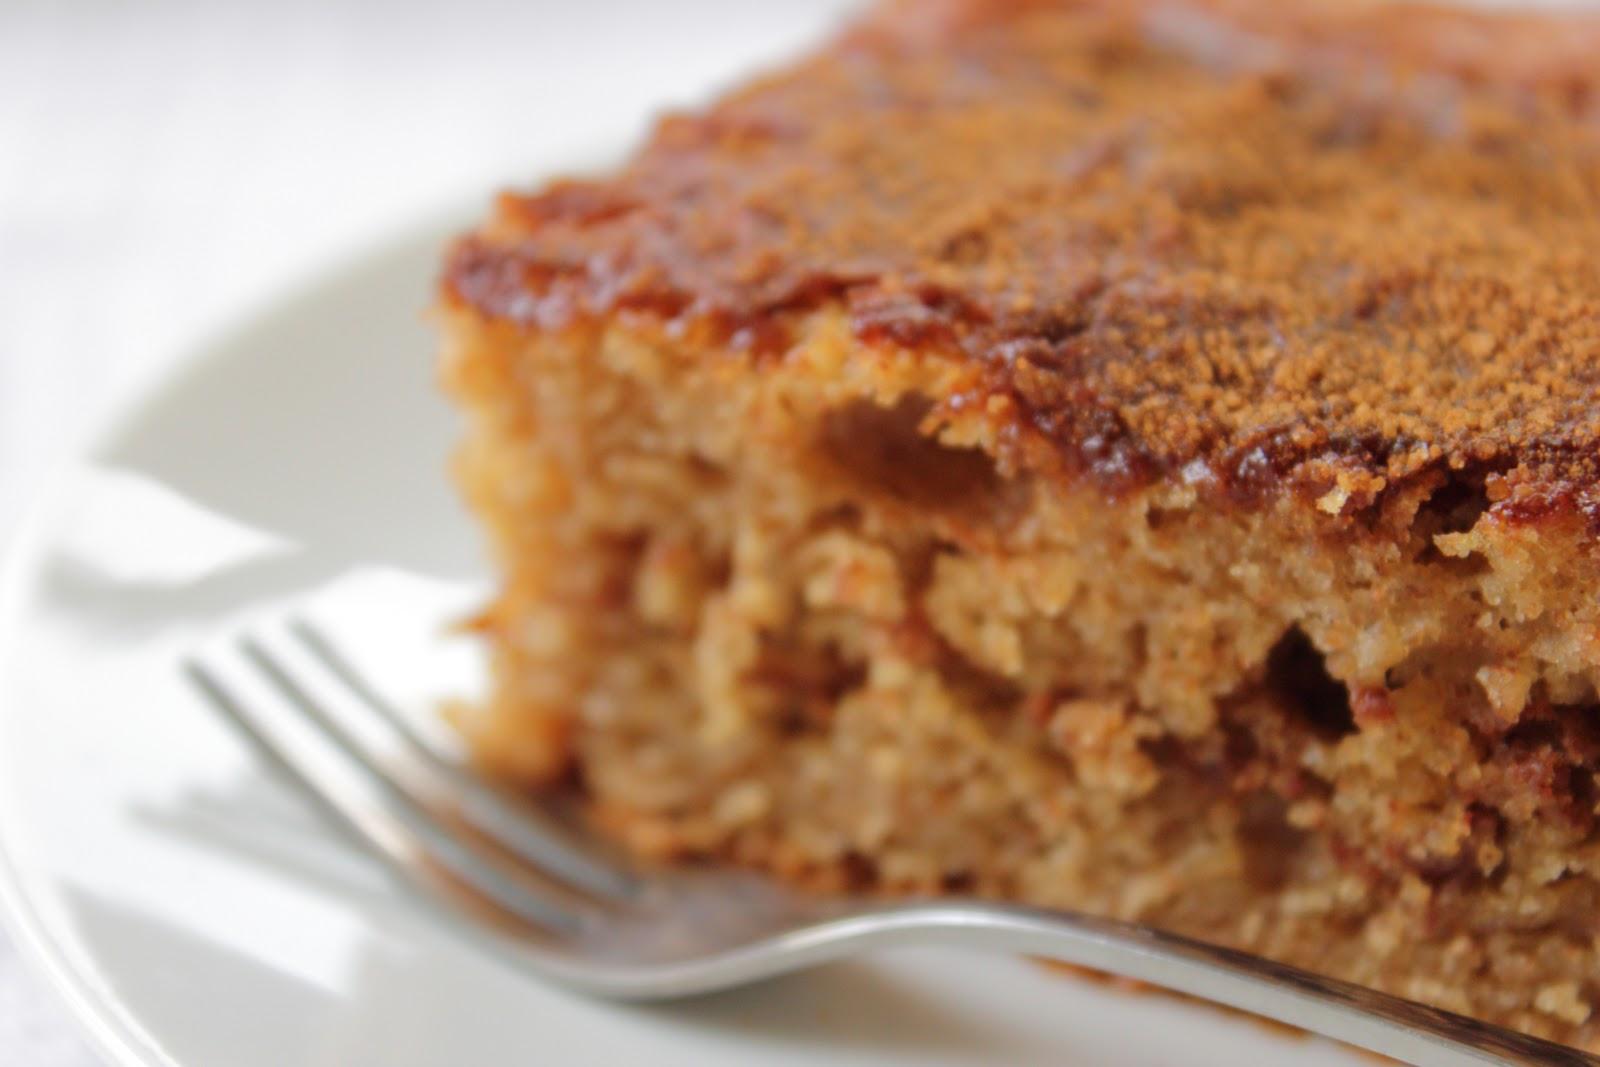 sixteenbeans.: Cinnamon Streusel Coffee Cake